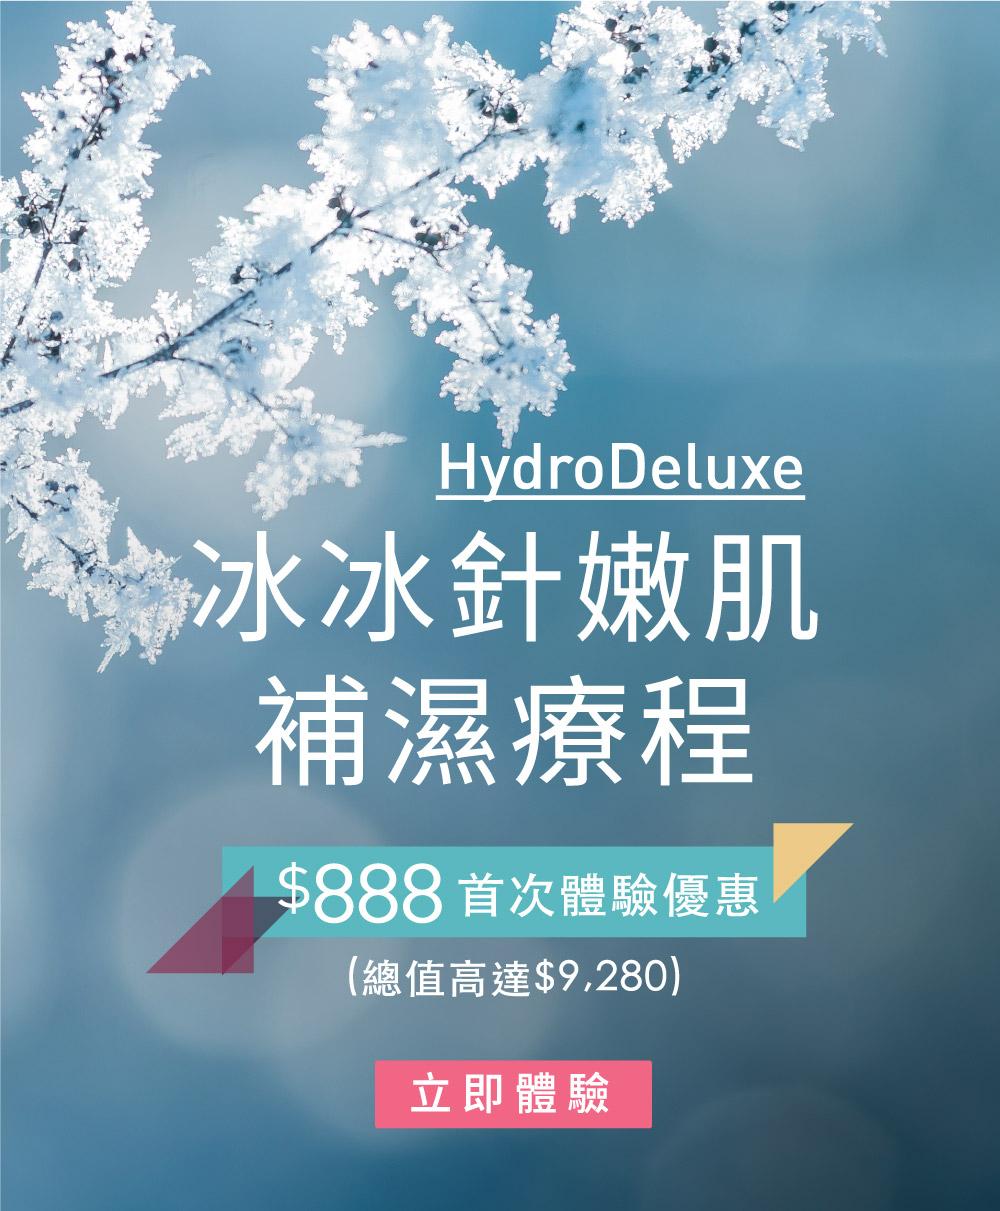 HydroDeluxe冰冰針嫩肌補濕療程